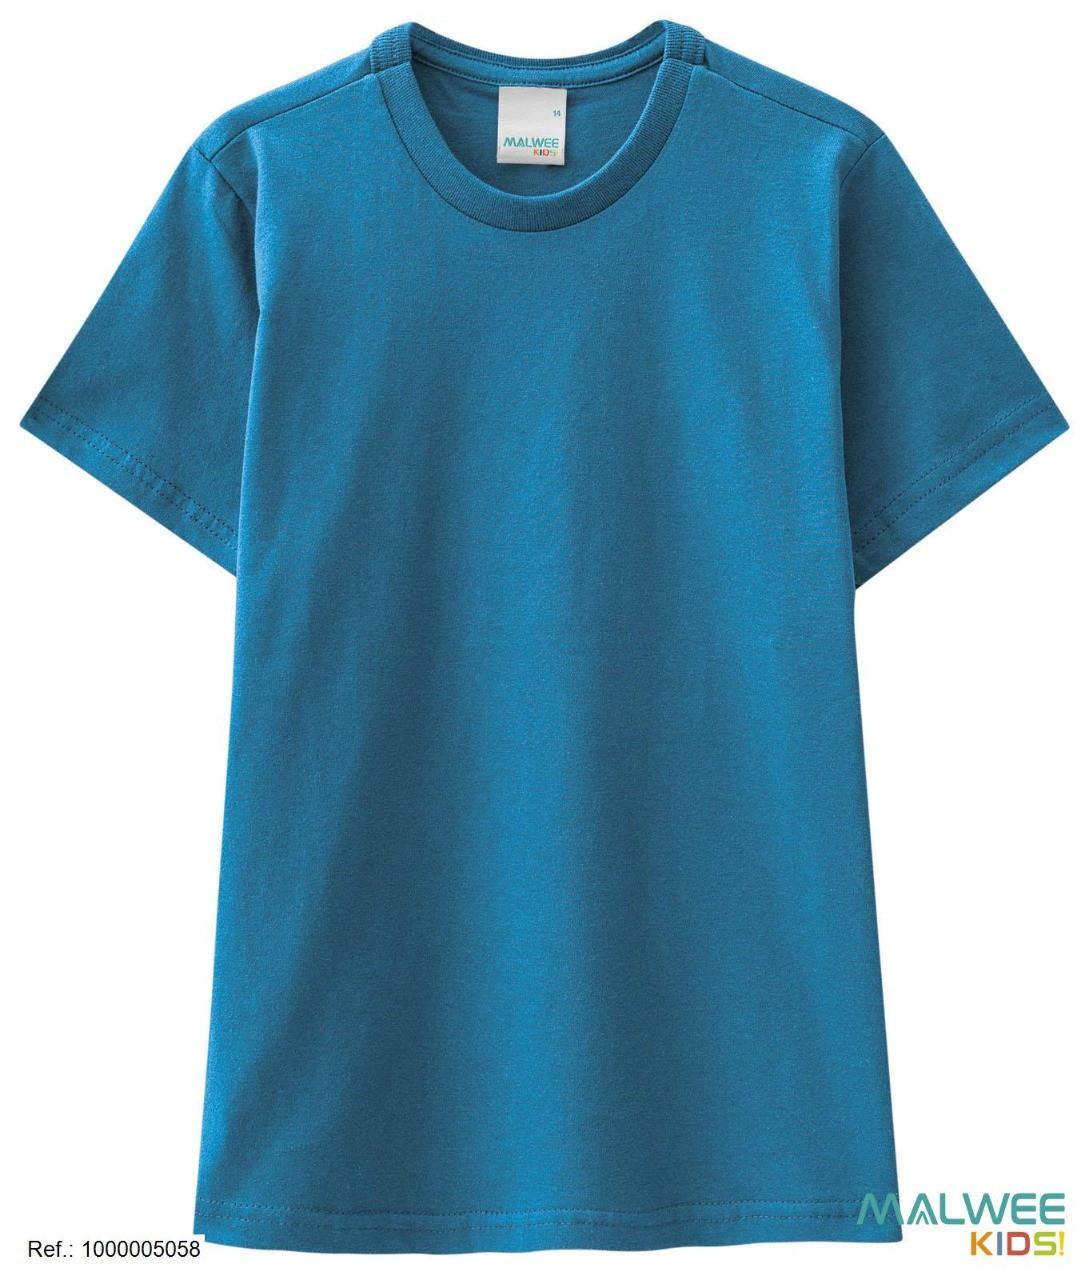 Camiseta Algodão Malwee - Azul